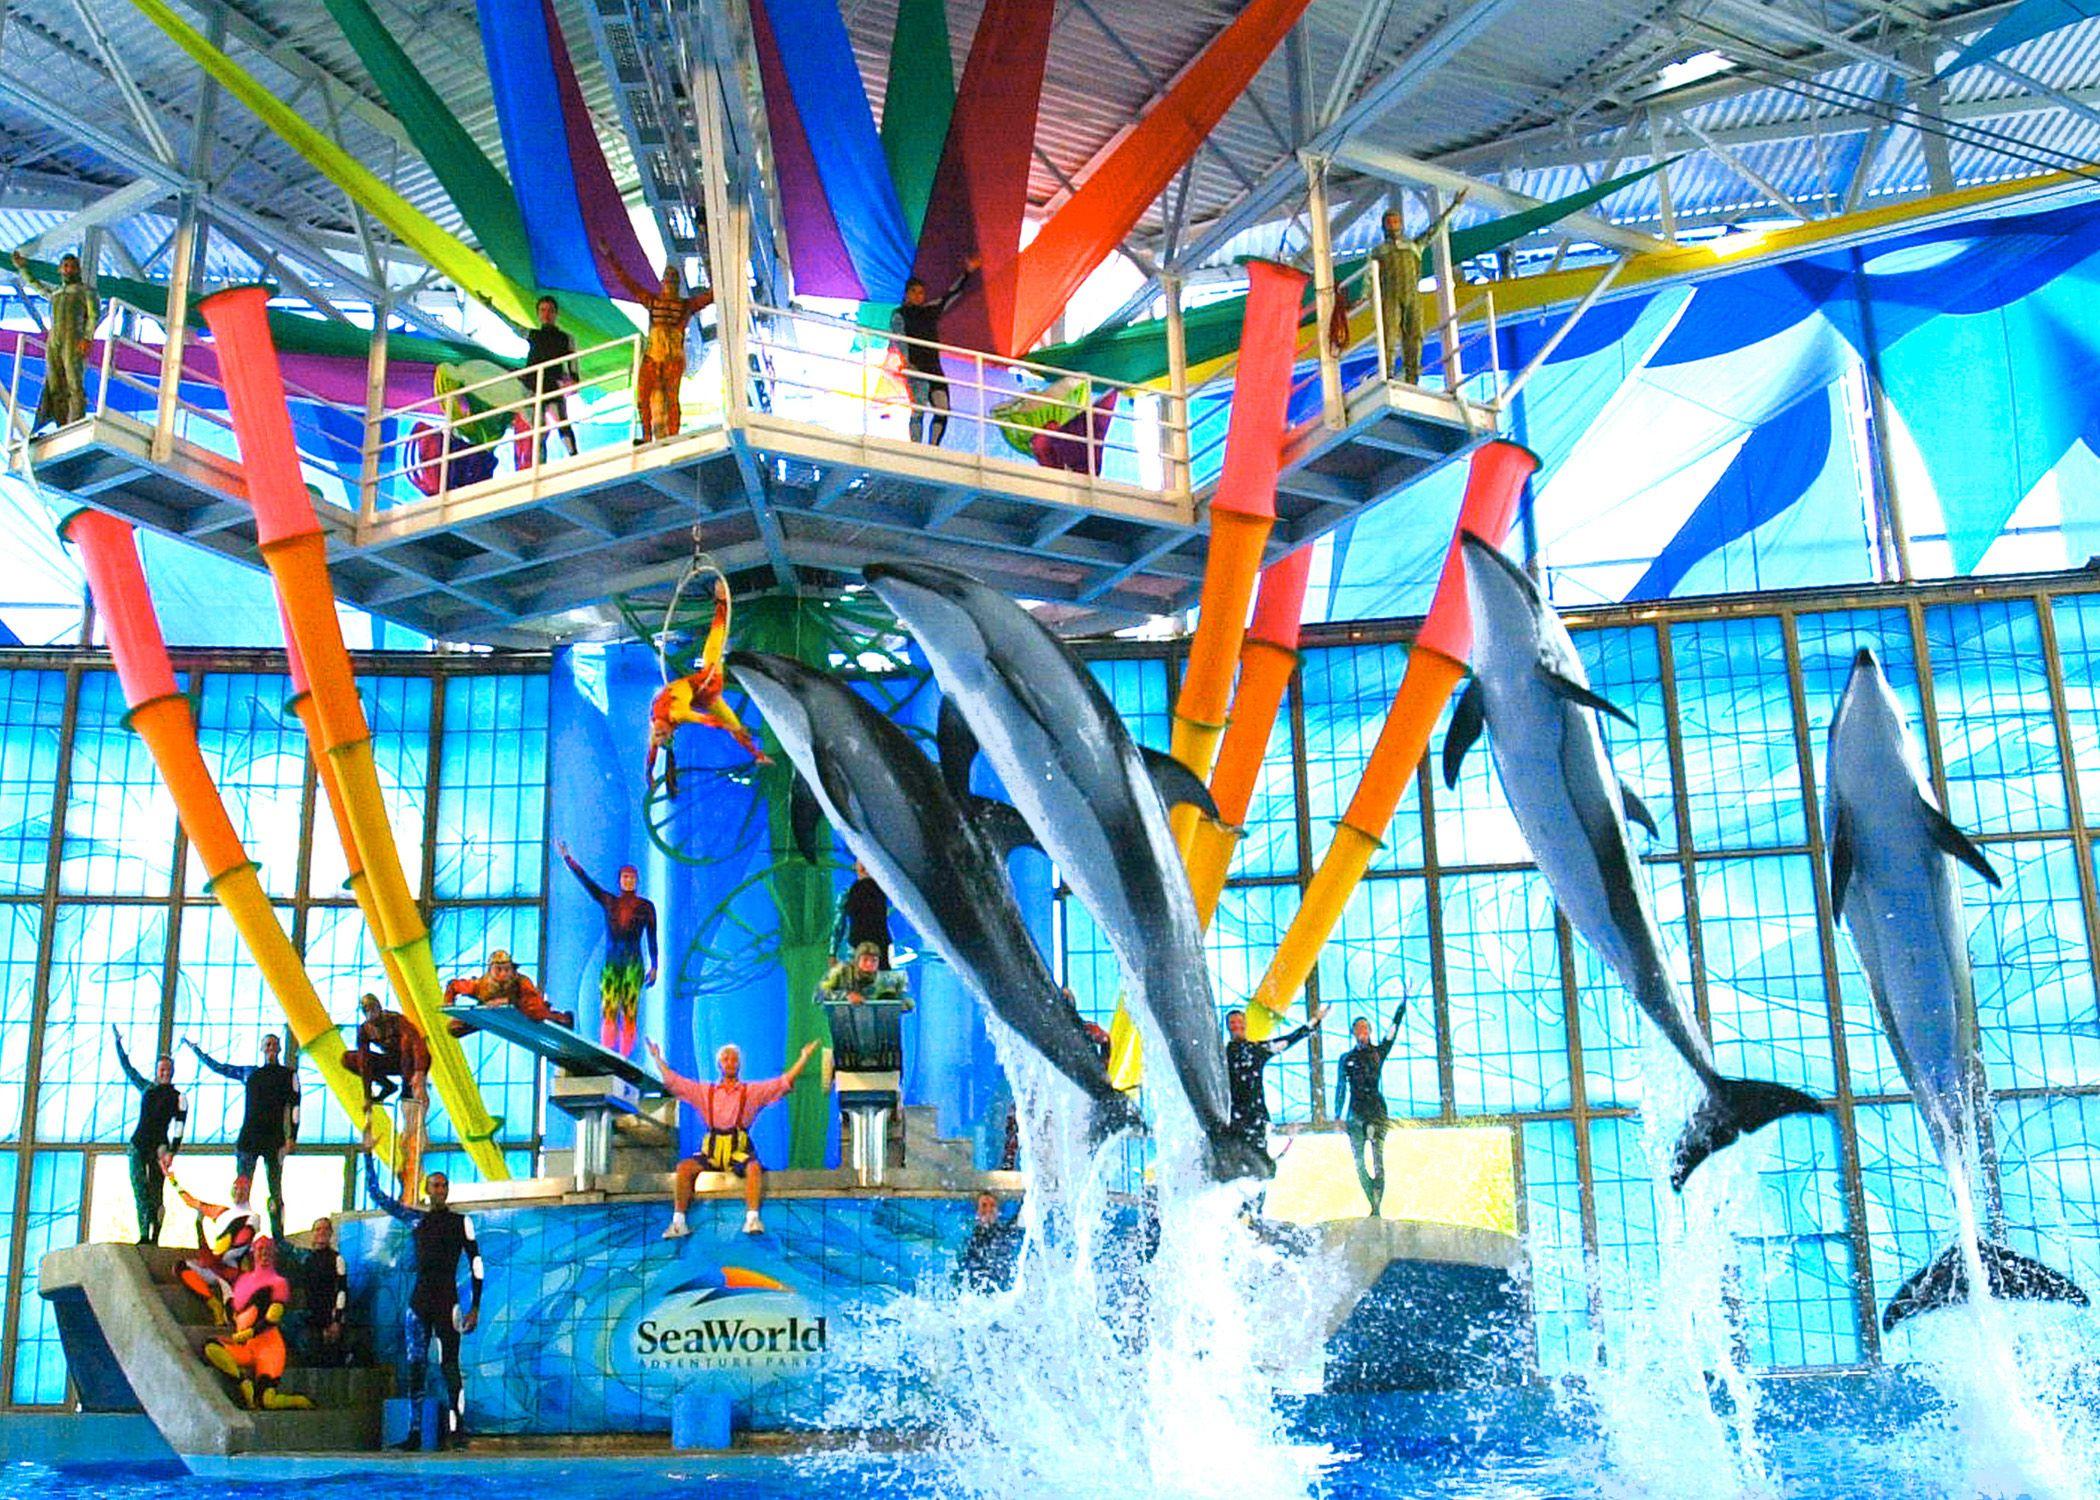 Thetouroperator Com Seaworld San Antonio Vacation Trips Travel Sights